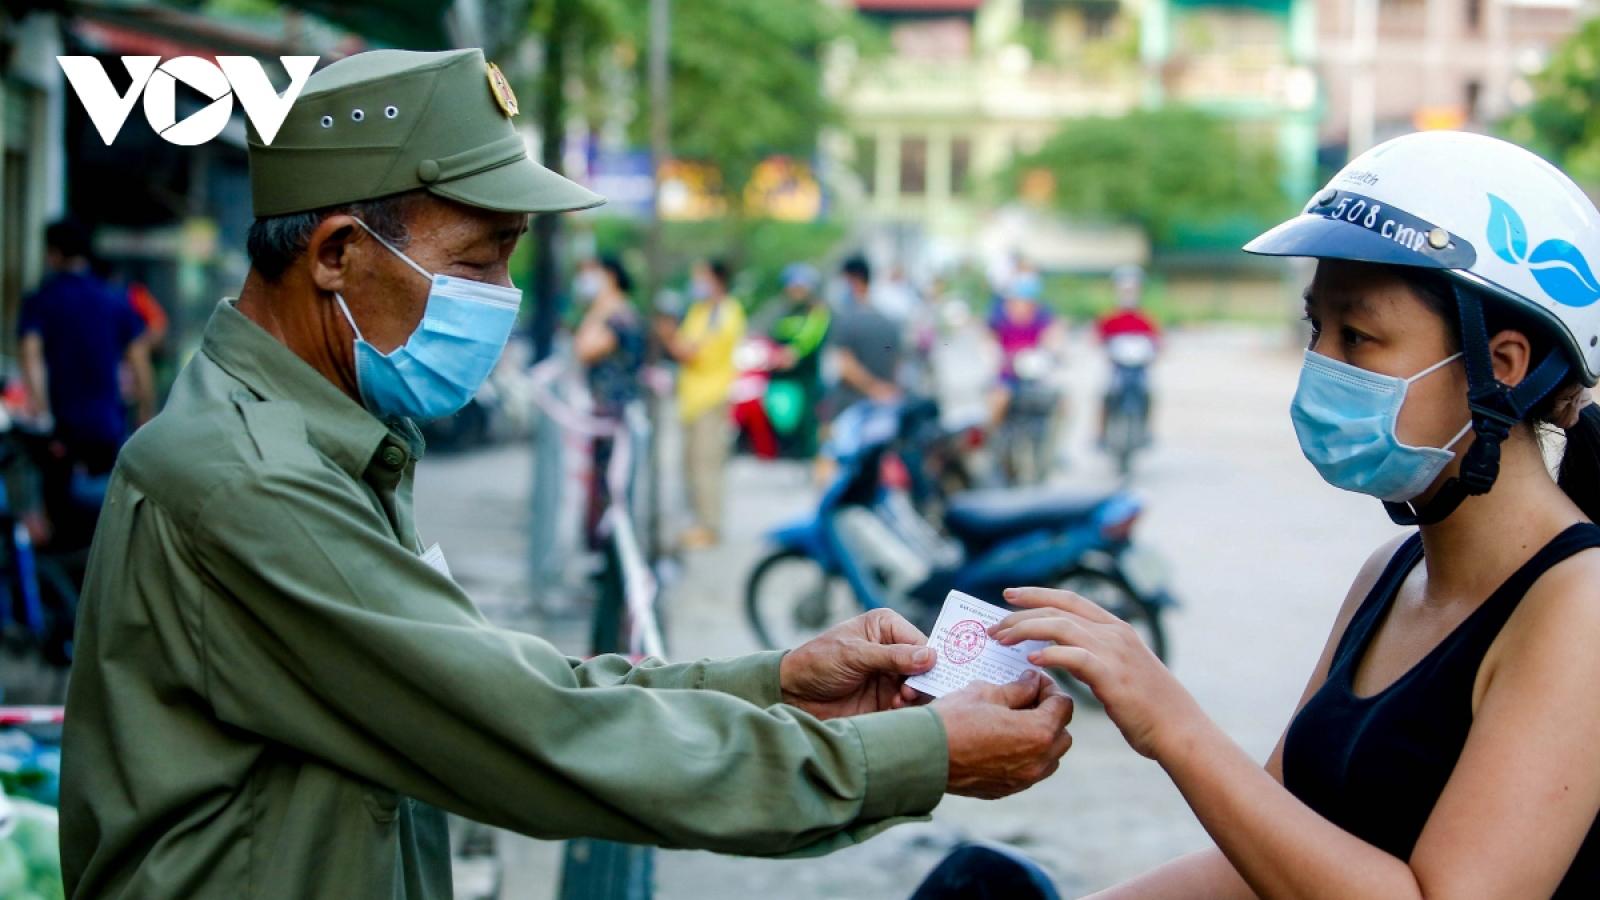 Hanoi capital offers market coupons amid rising COVID-19 threats